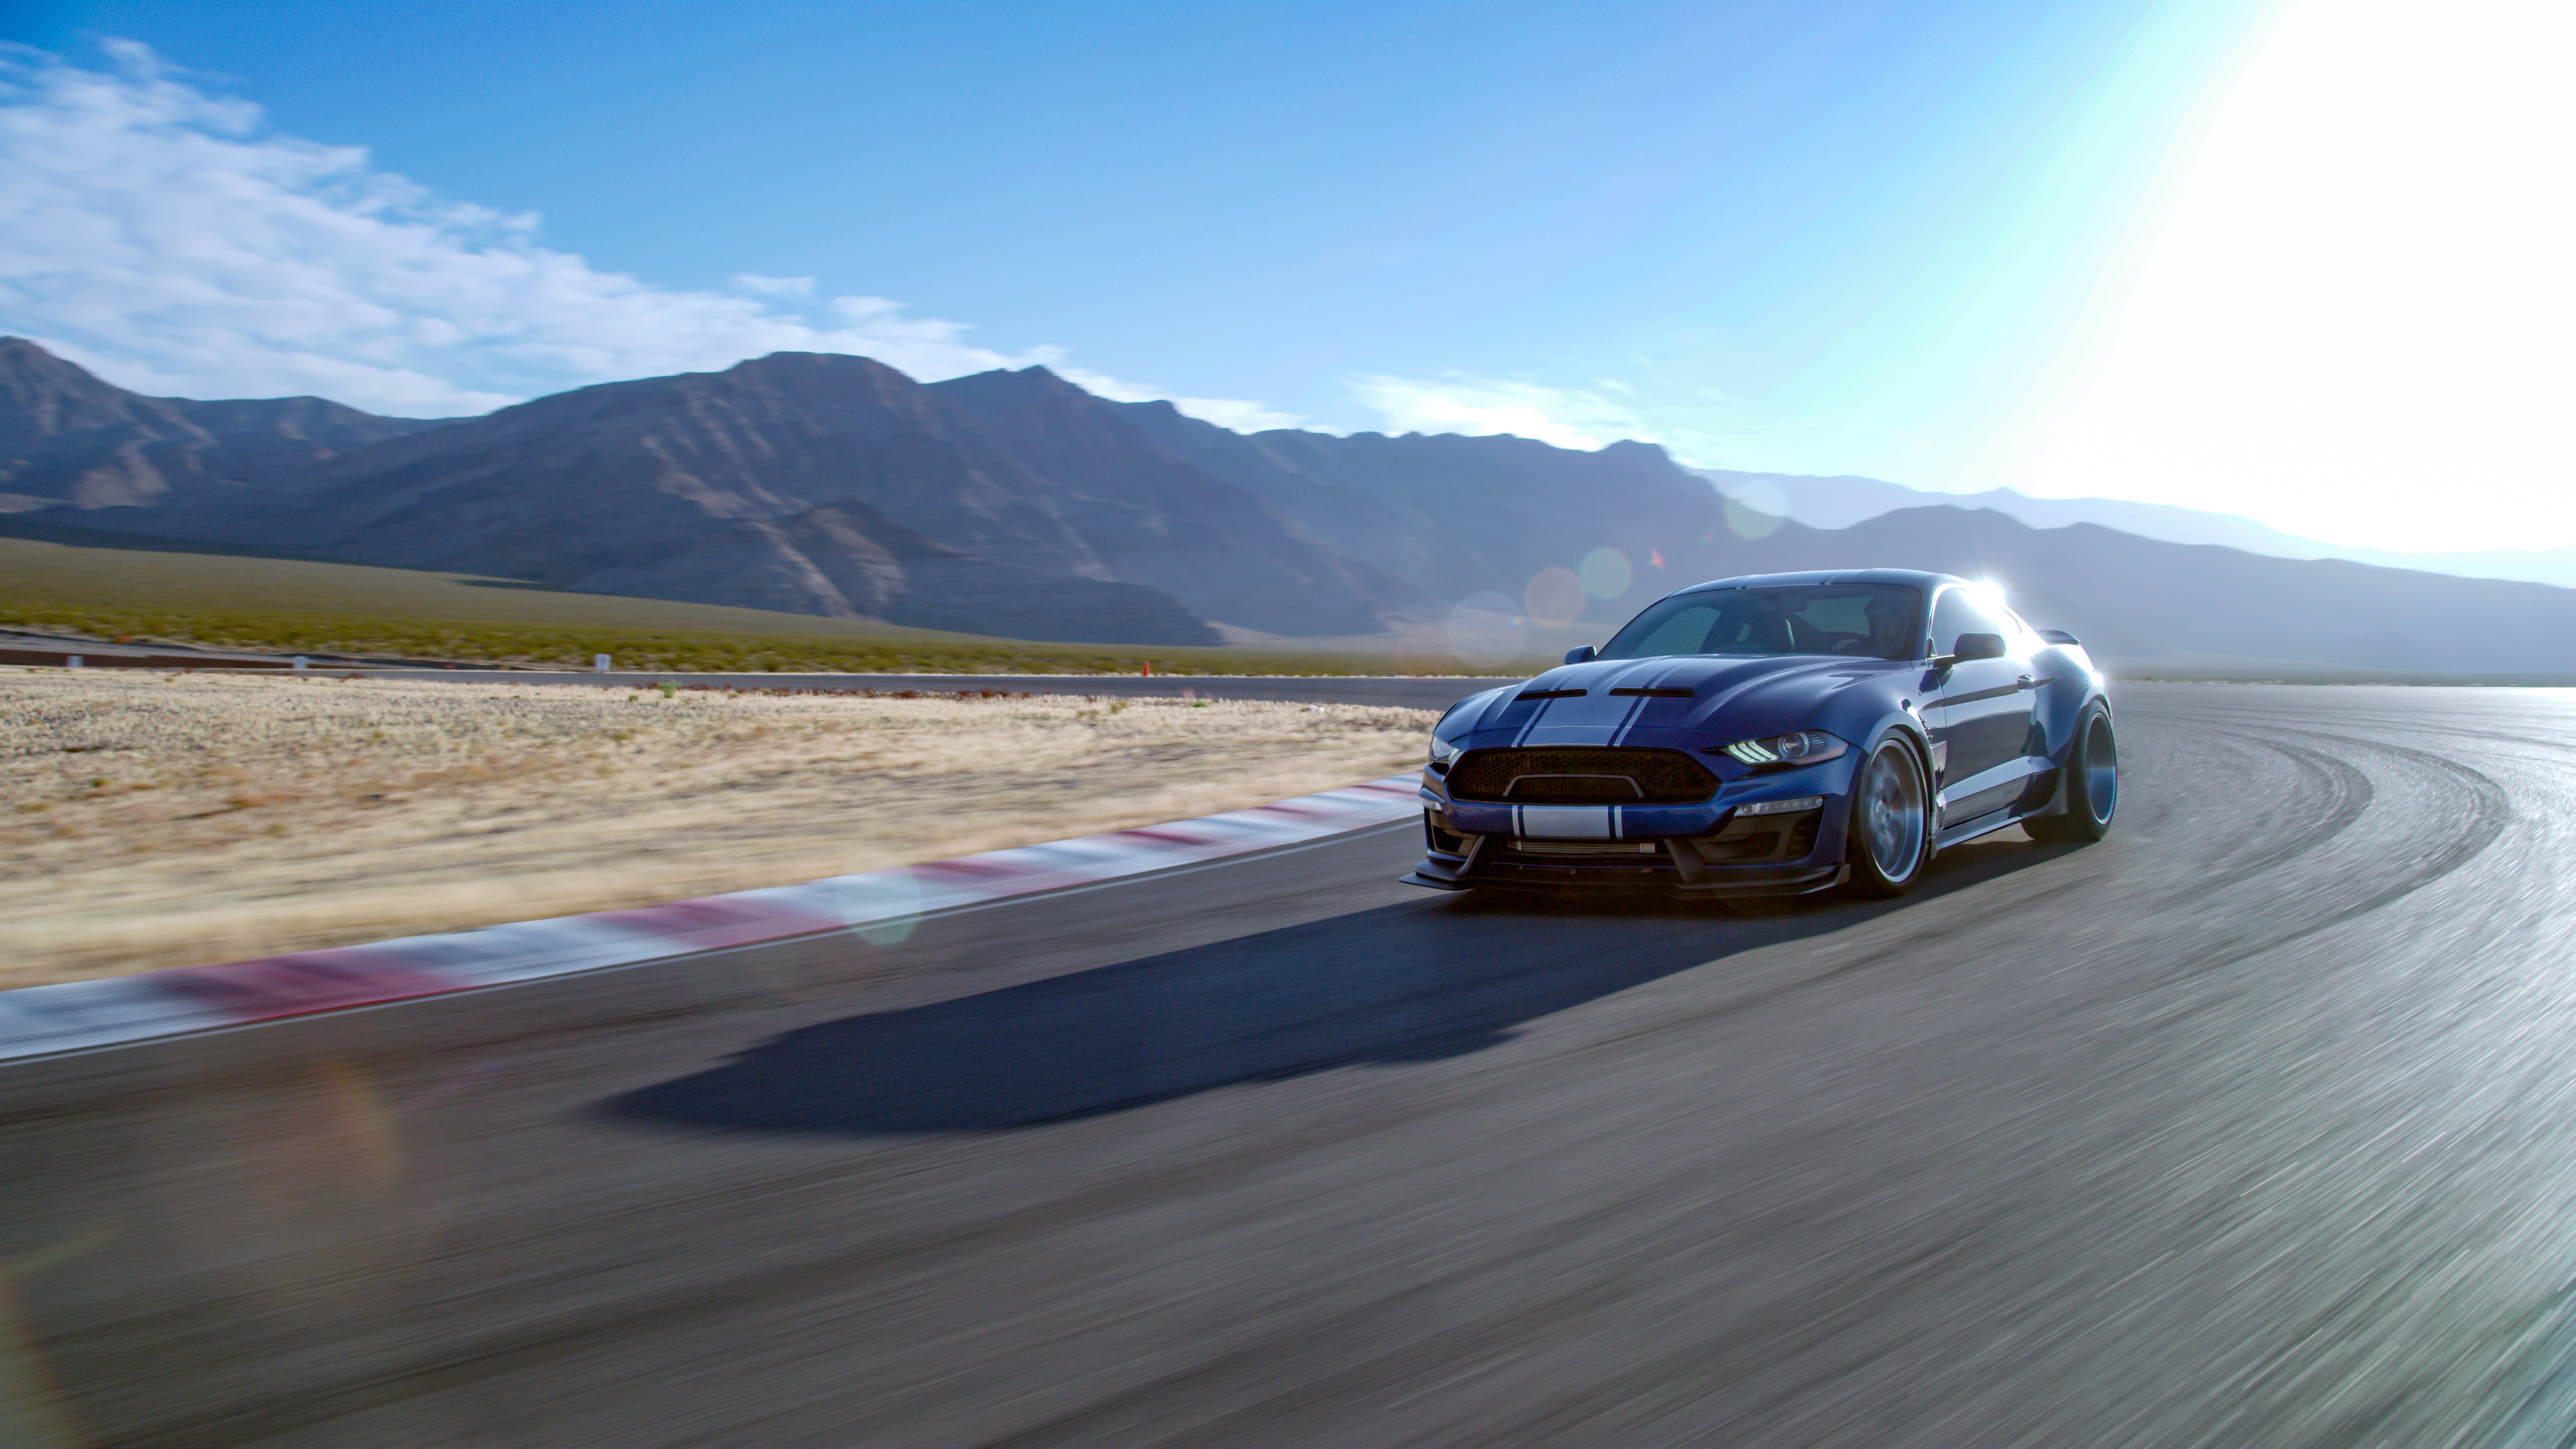 Ford Mustang Wallpaper 4K Download